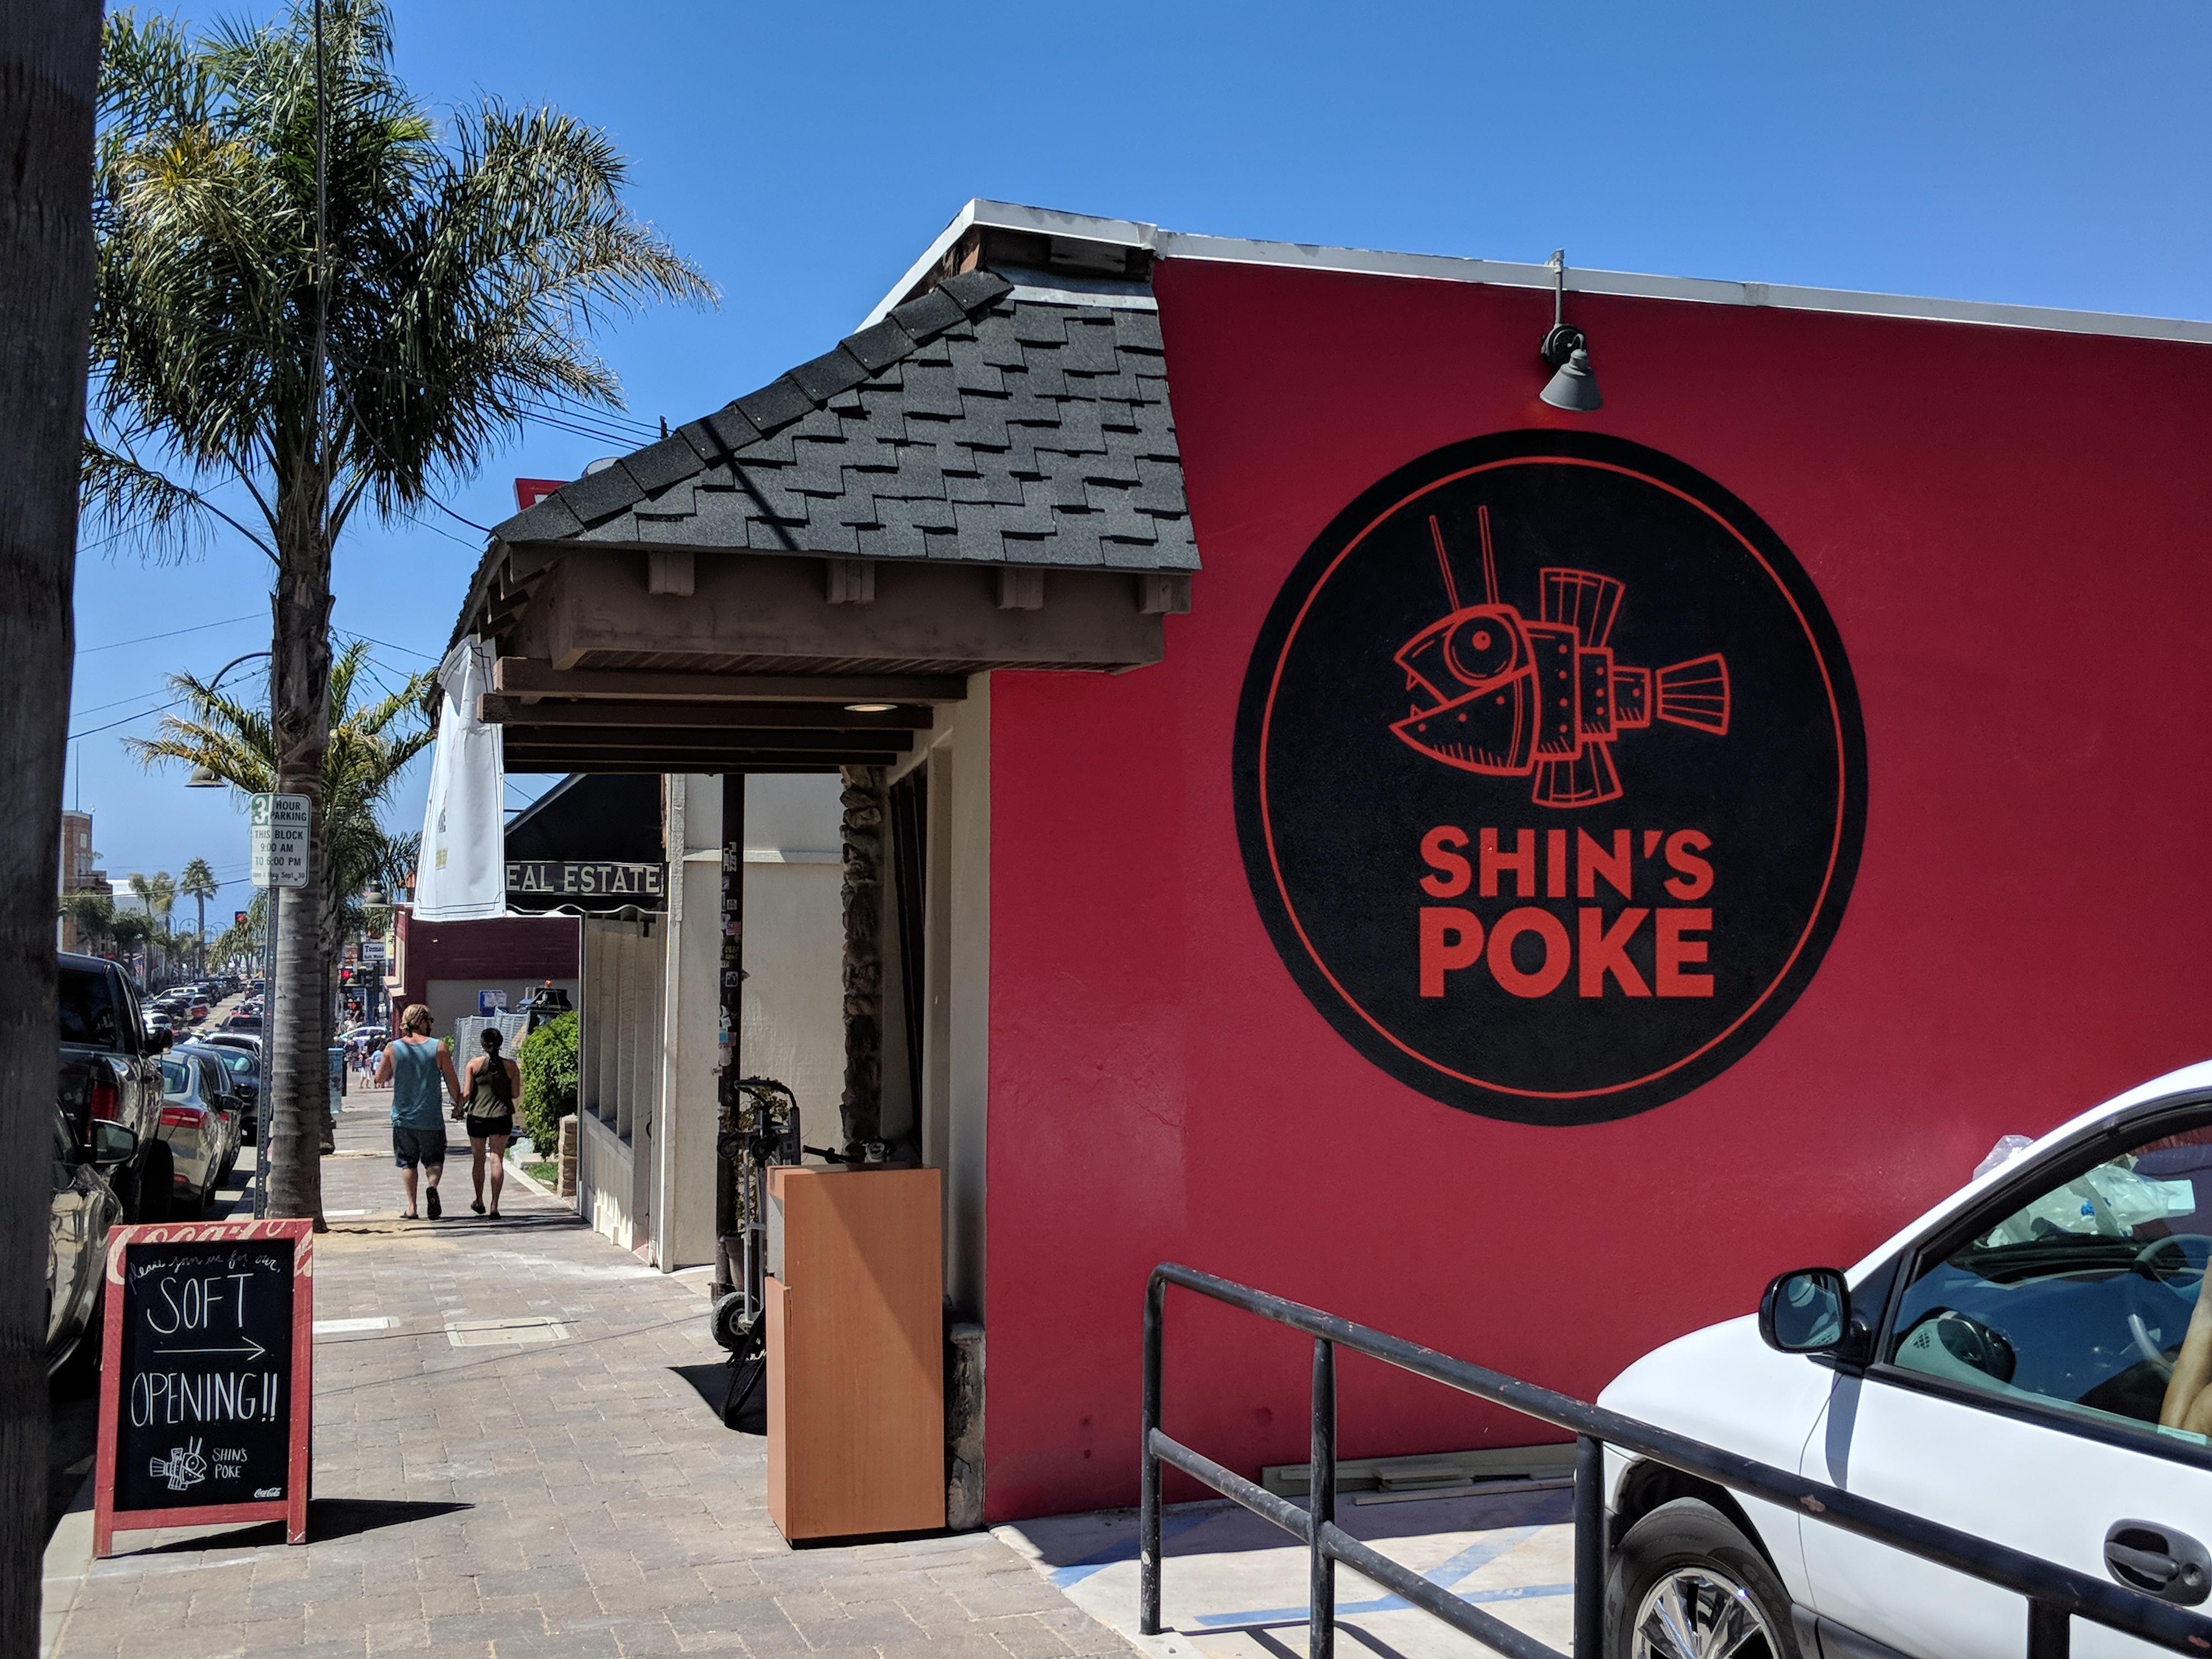 Shin's Poke